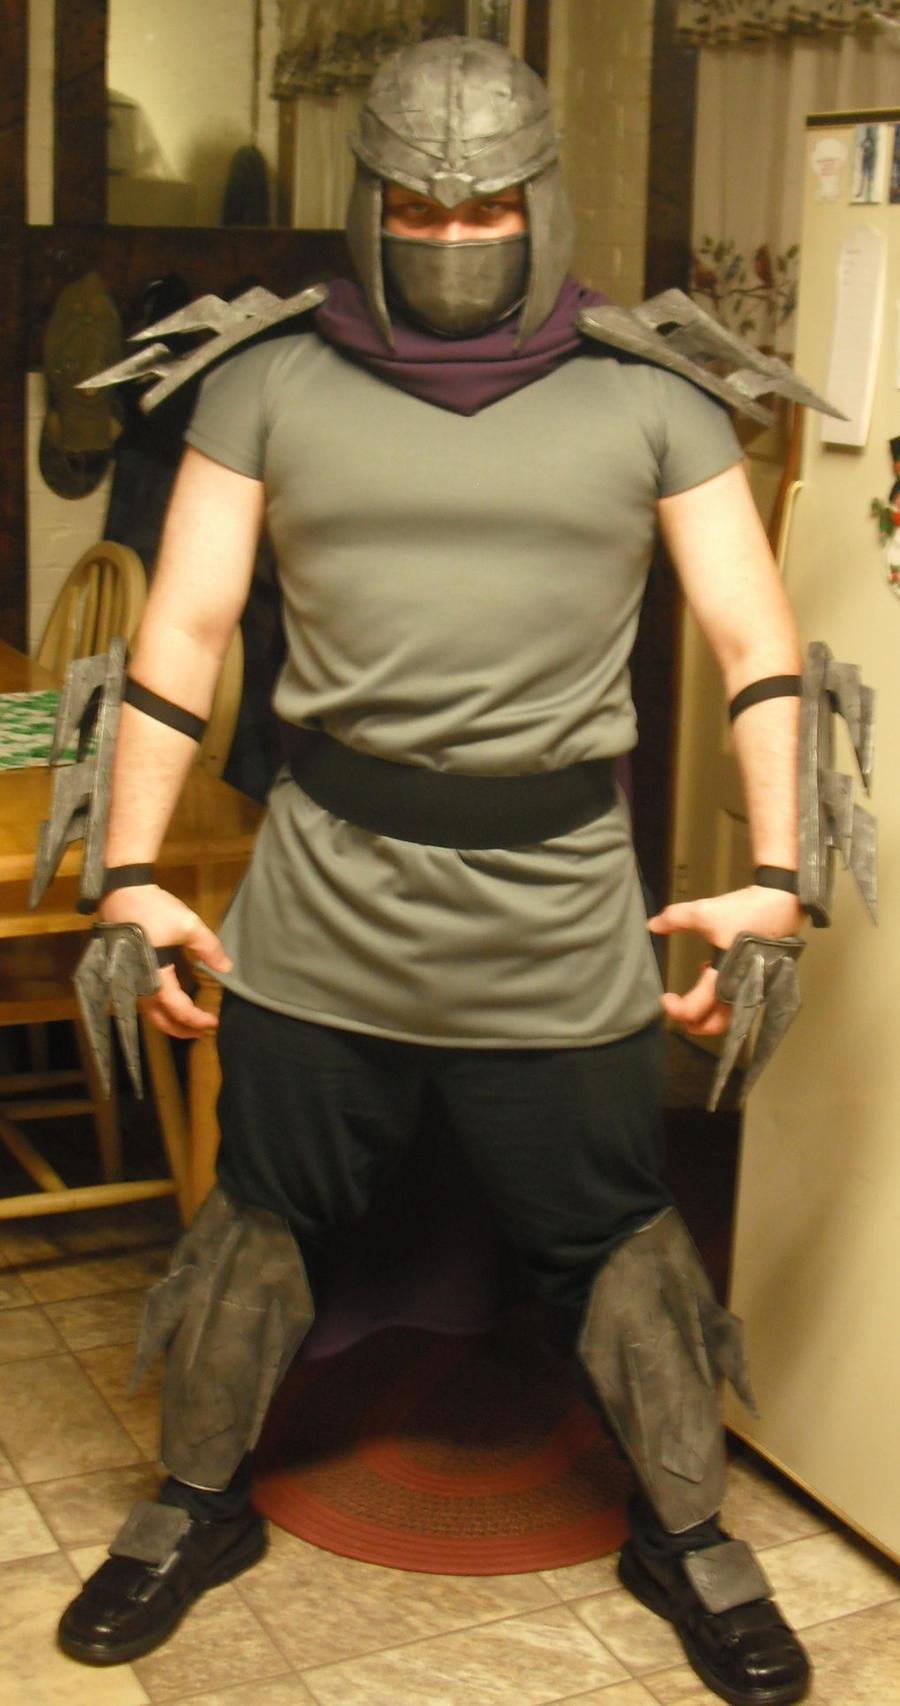 Shredder cosplay costume viewing gallery